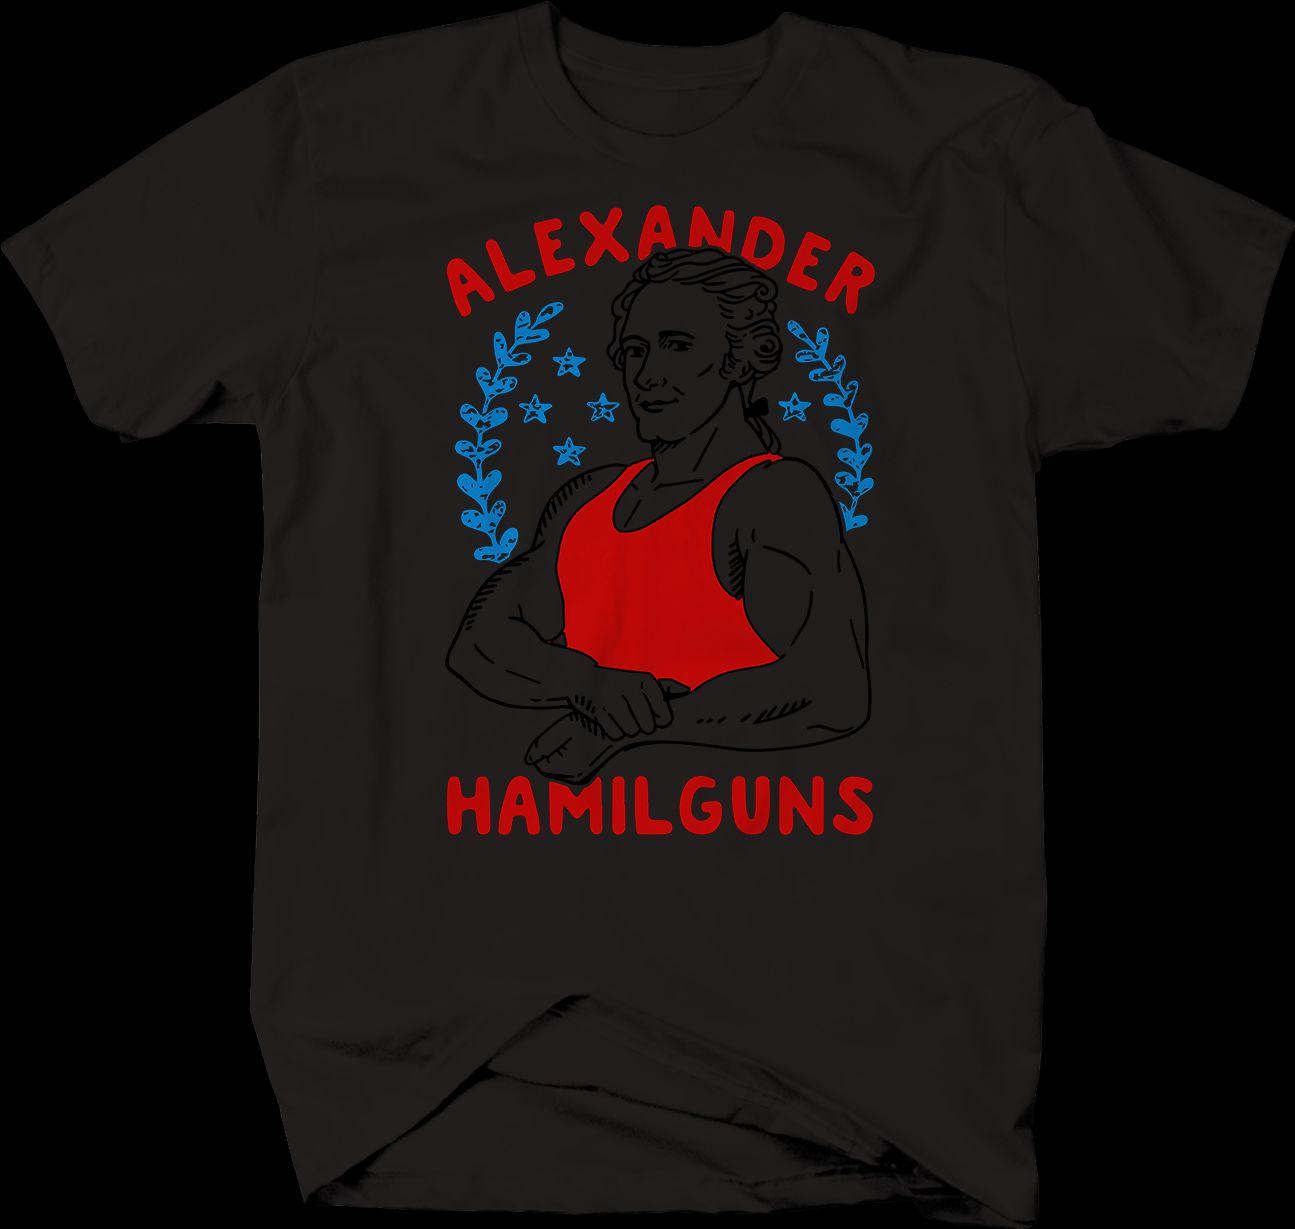 dd0b4e109 Alexander Hamilton Hamil Guns President Workout Gym Muscles T Shirt Cool  Tee Shirt T Shirt Online Buy From Kyngbee, $10.72| DHgate.Com